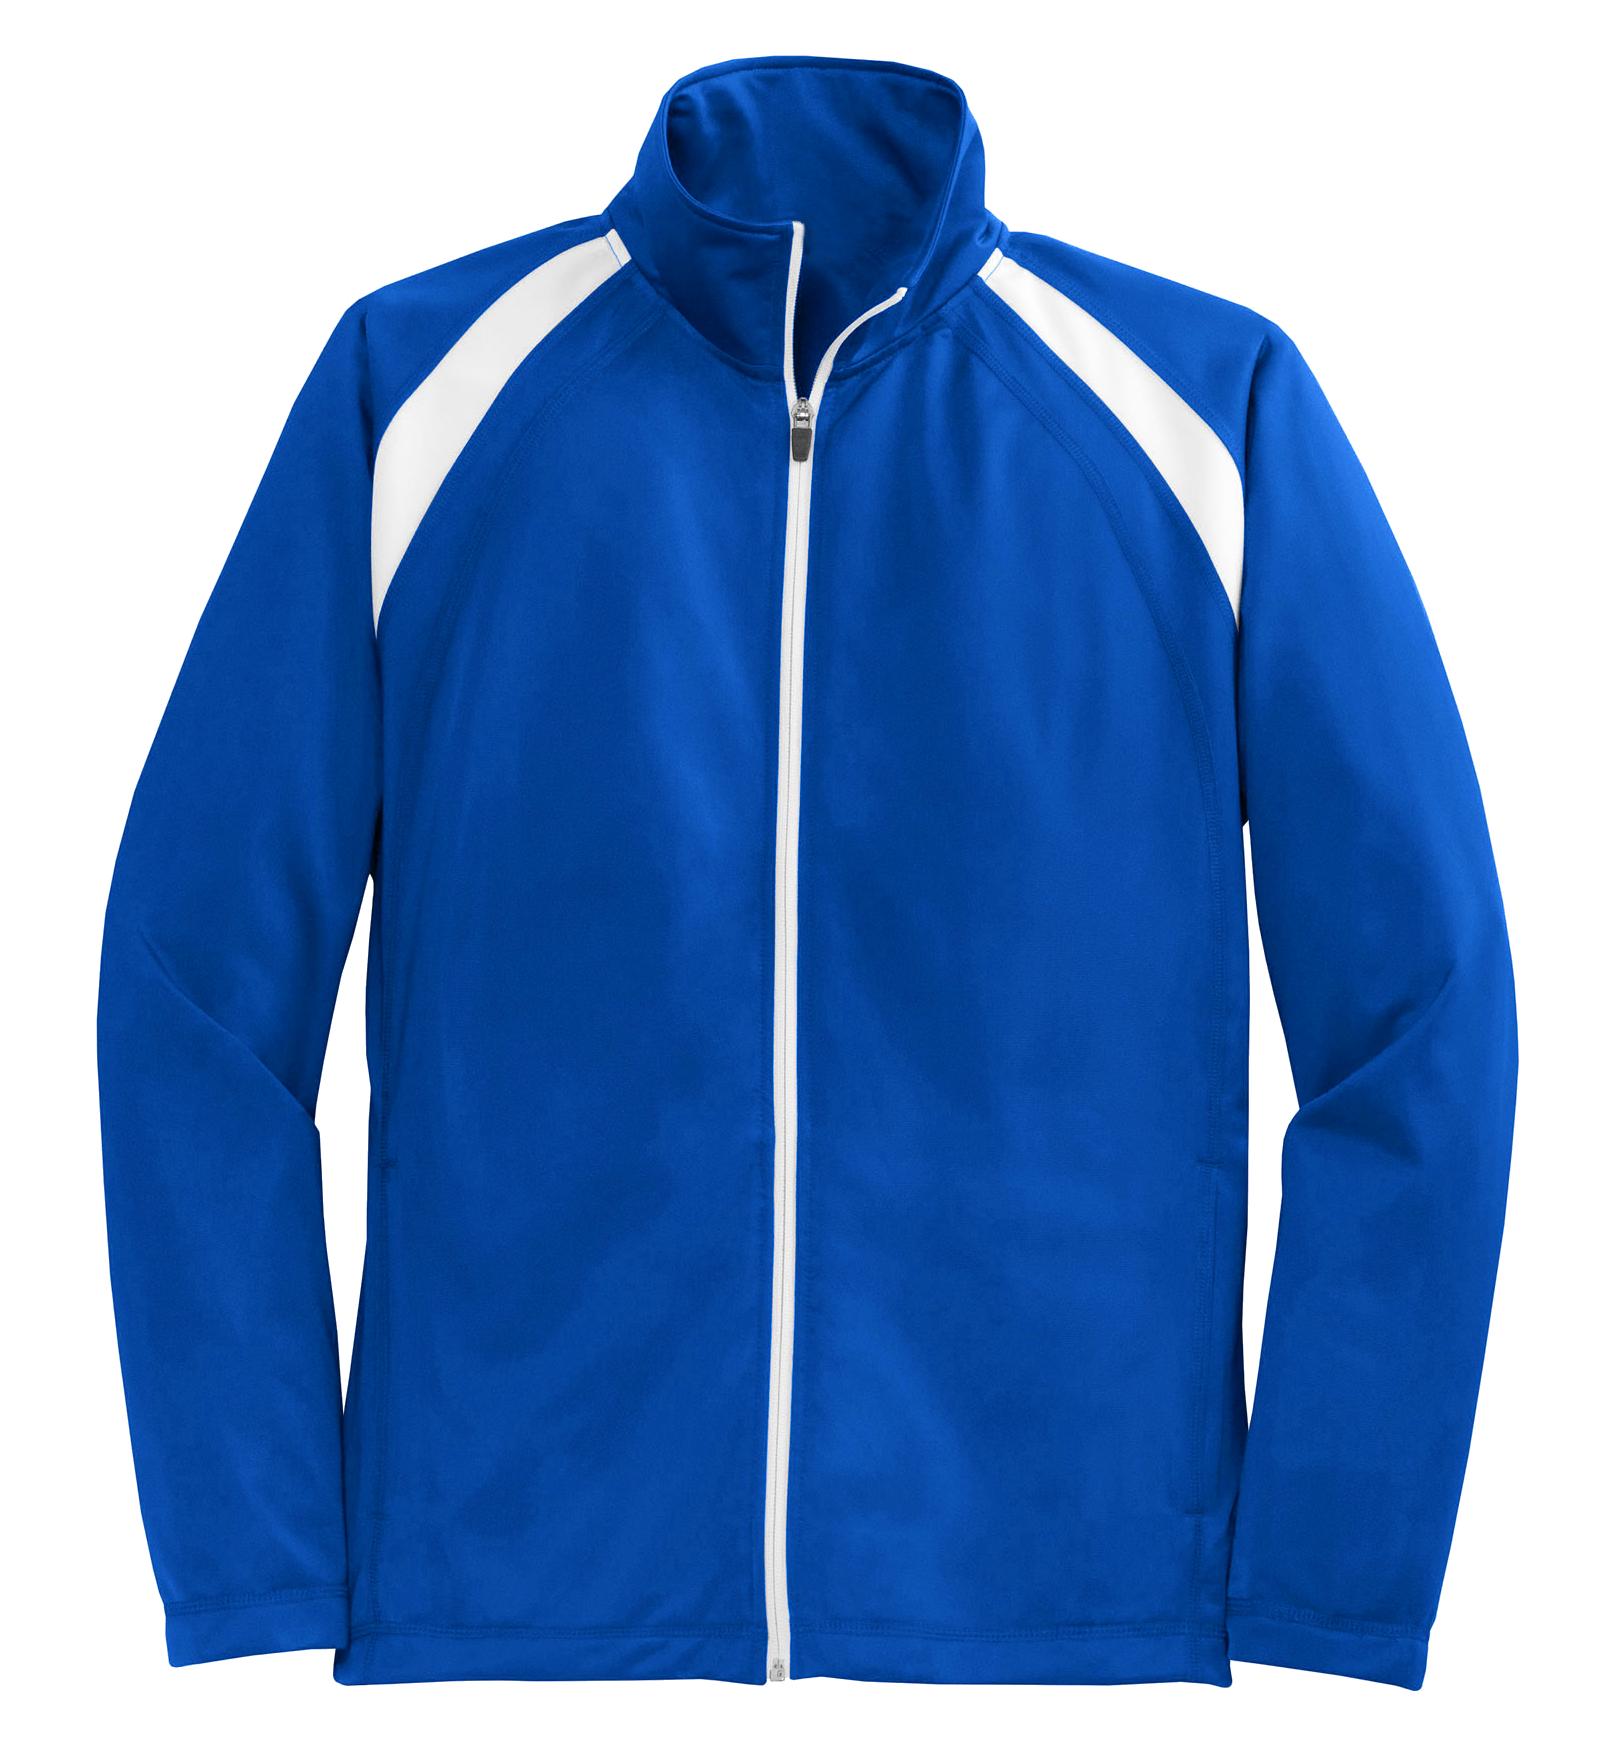 Jacket PNG Image